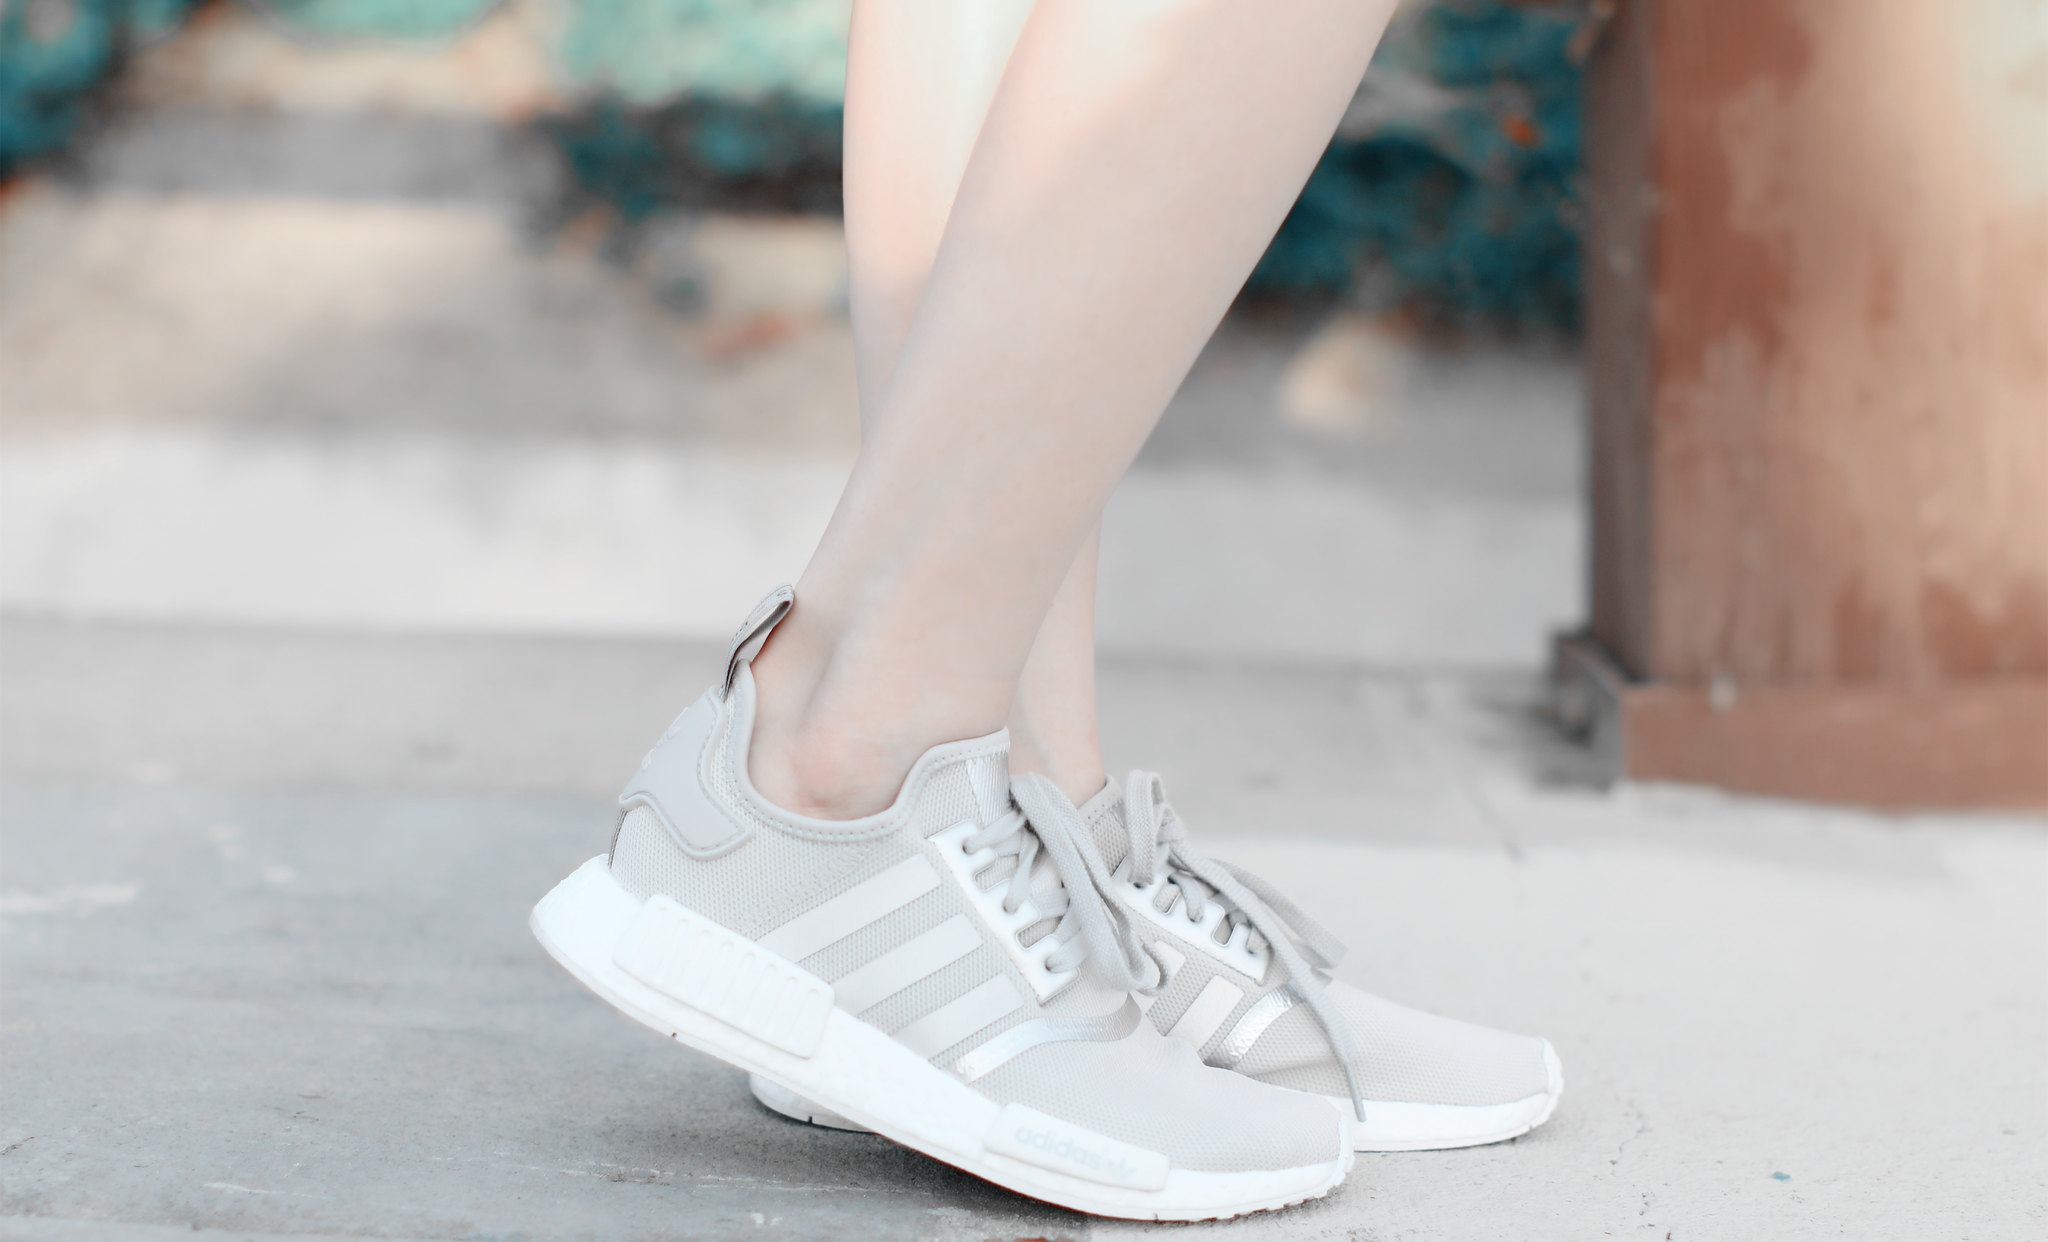 0866-modern-athleisure-adidas-adidasnmd-sporty-chic